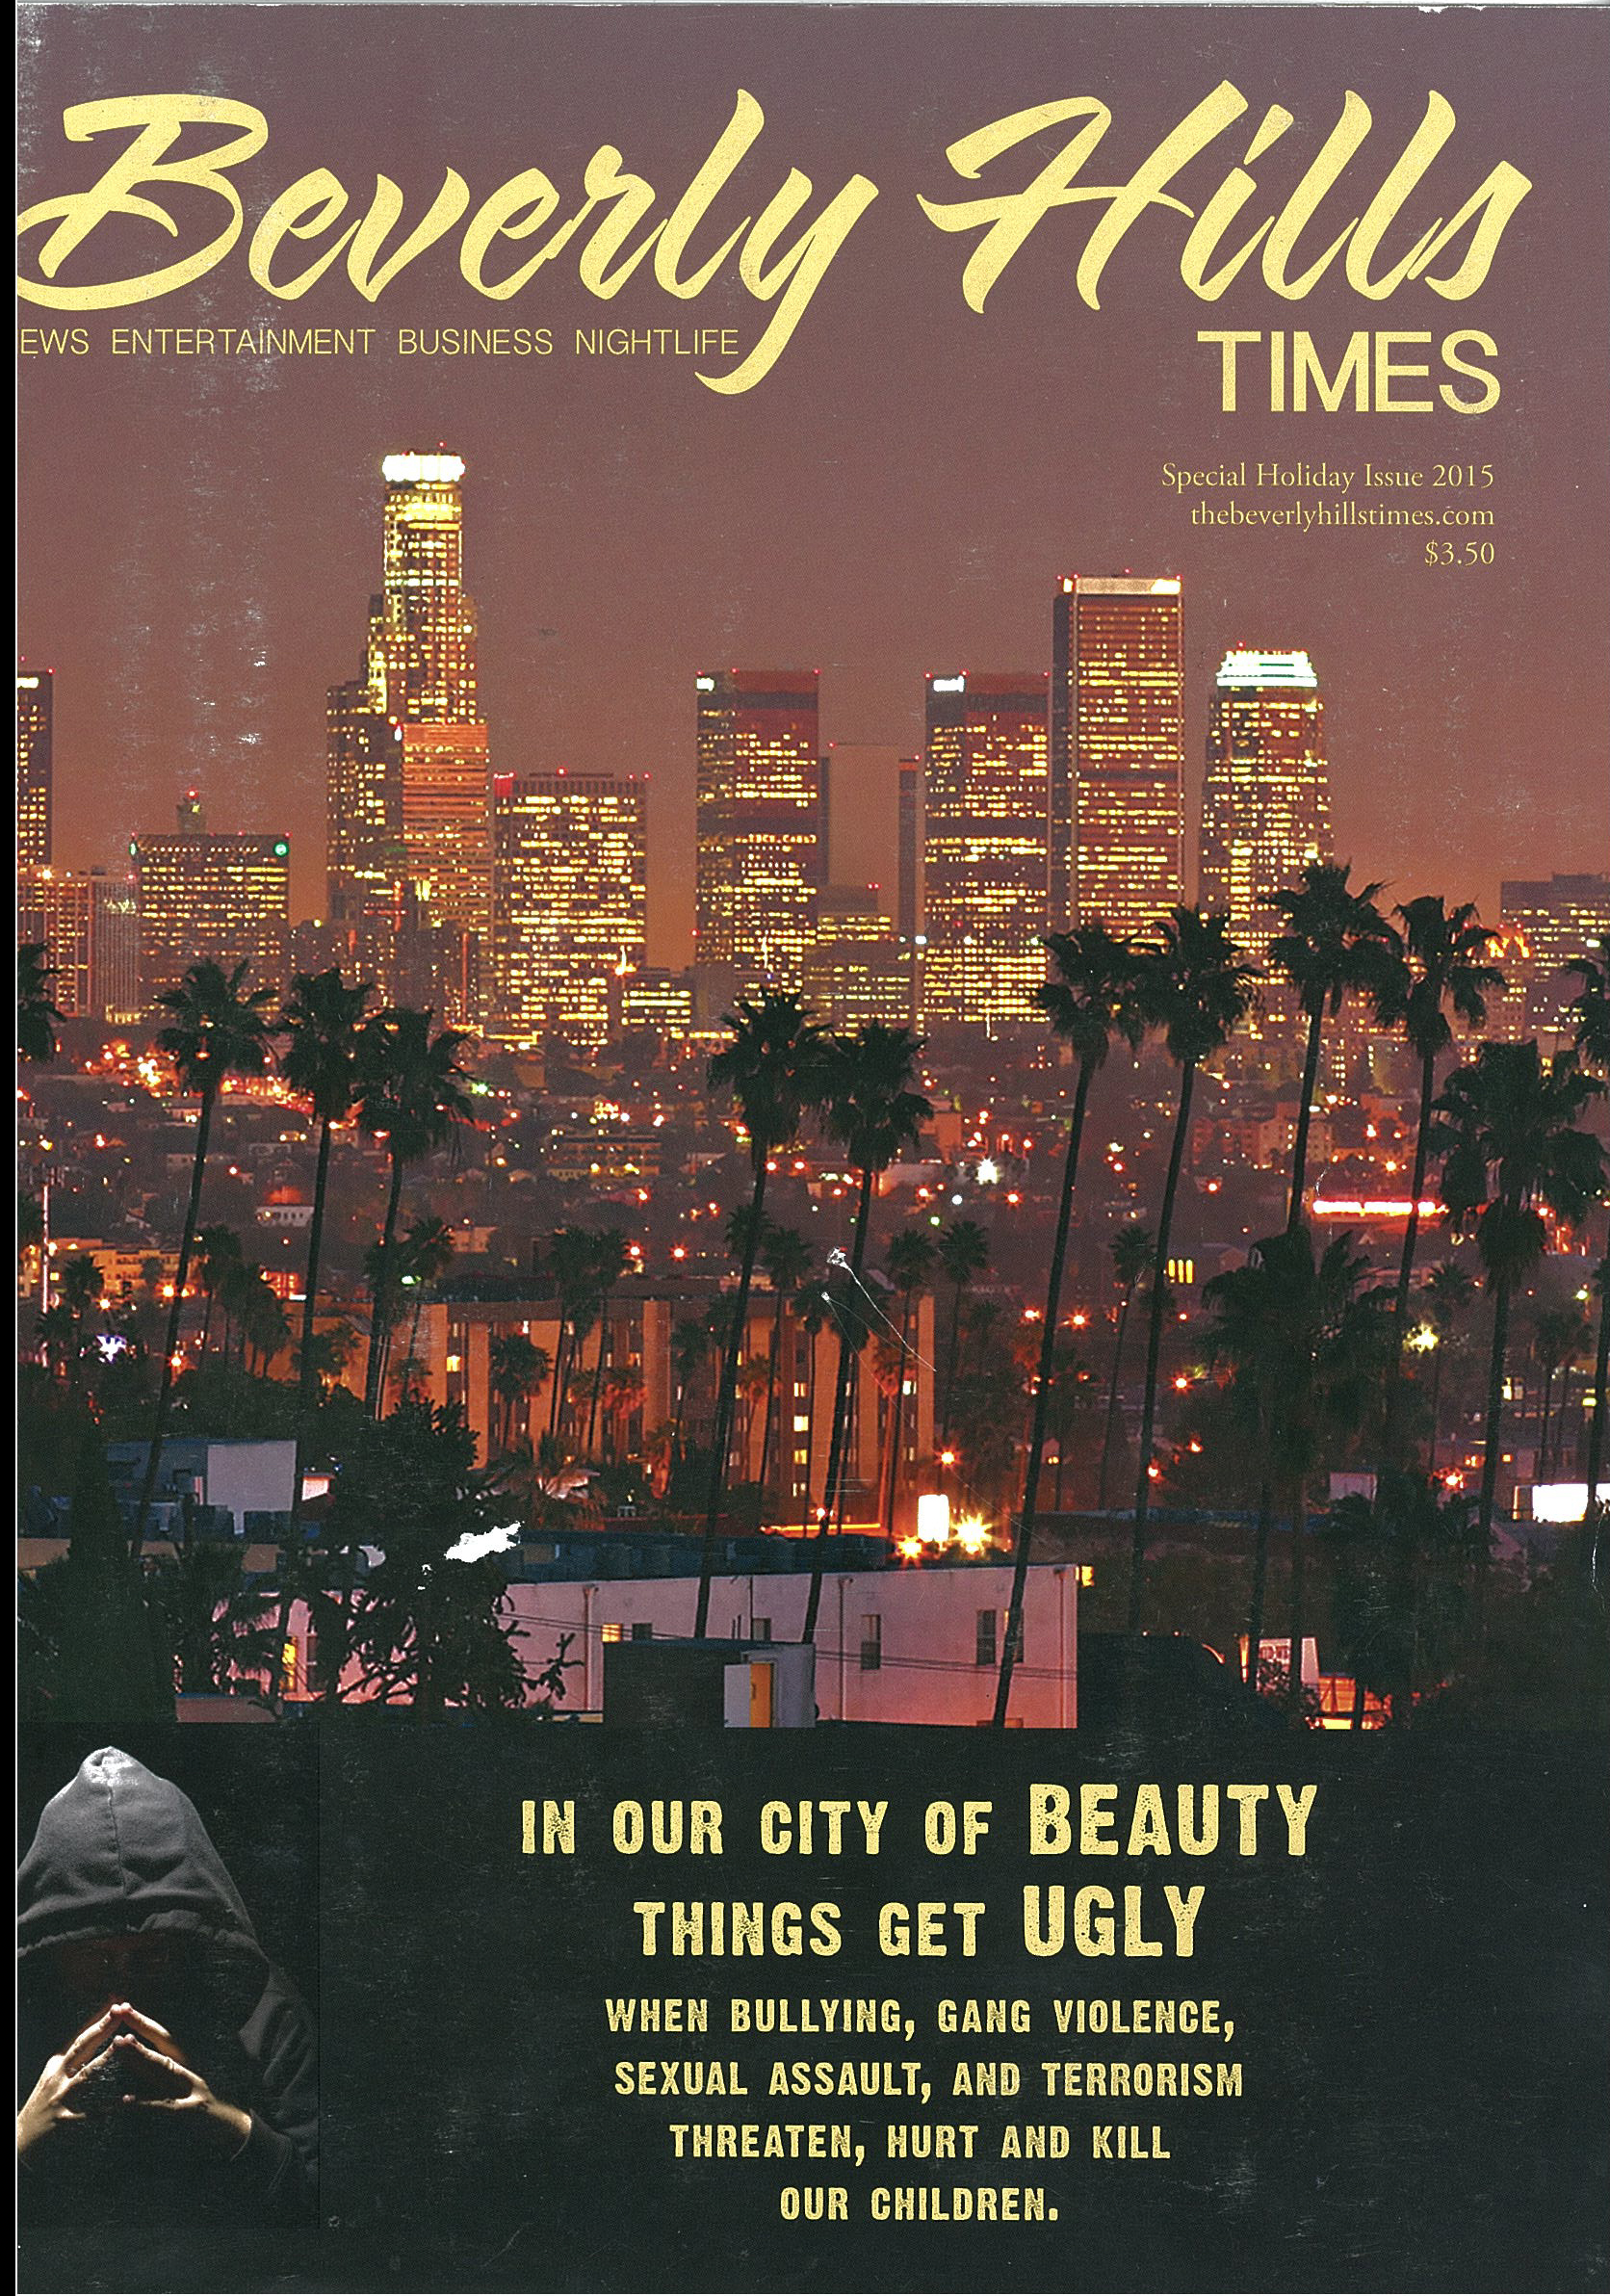 Beverly Hills times3 .jpg